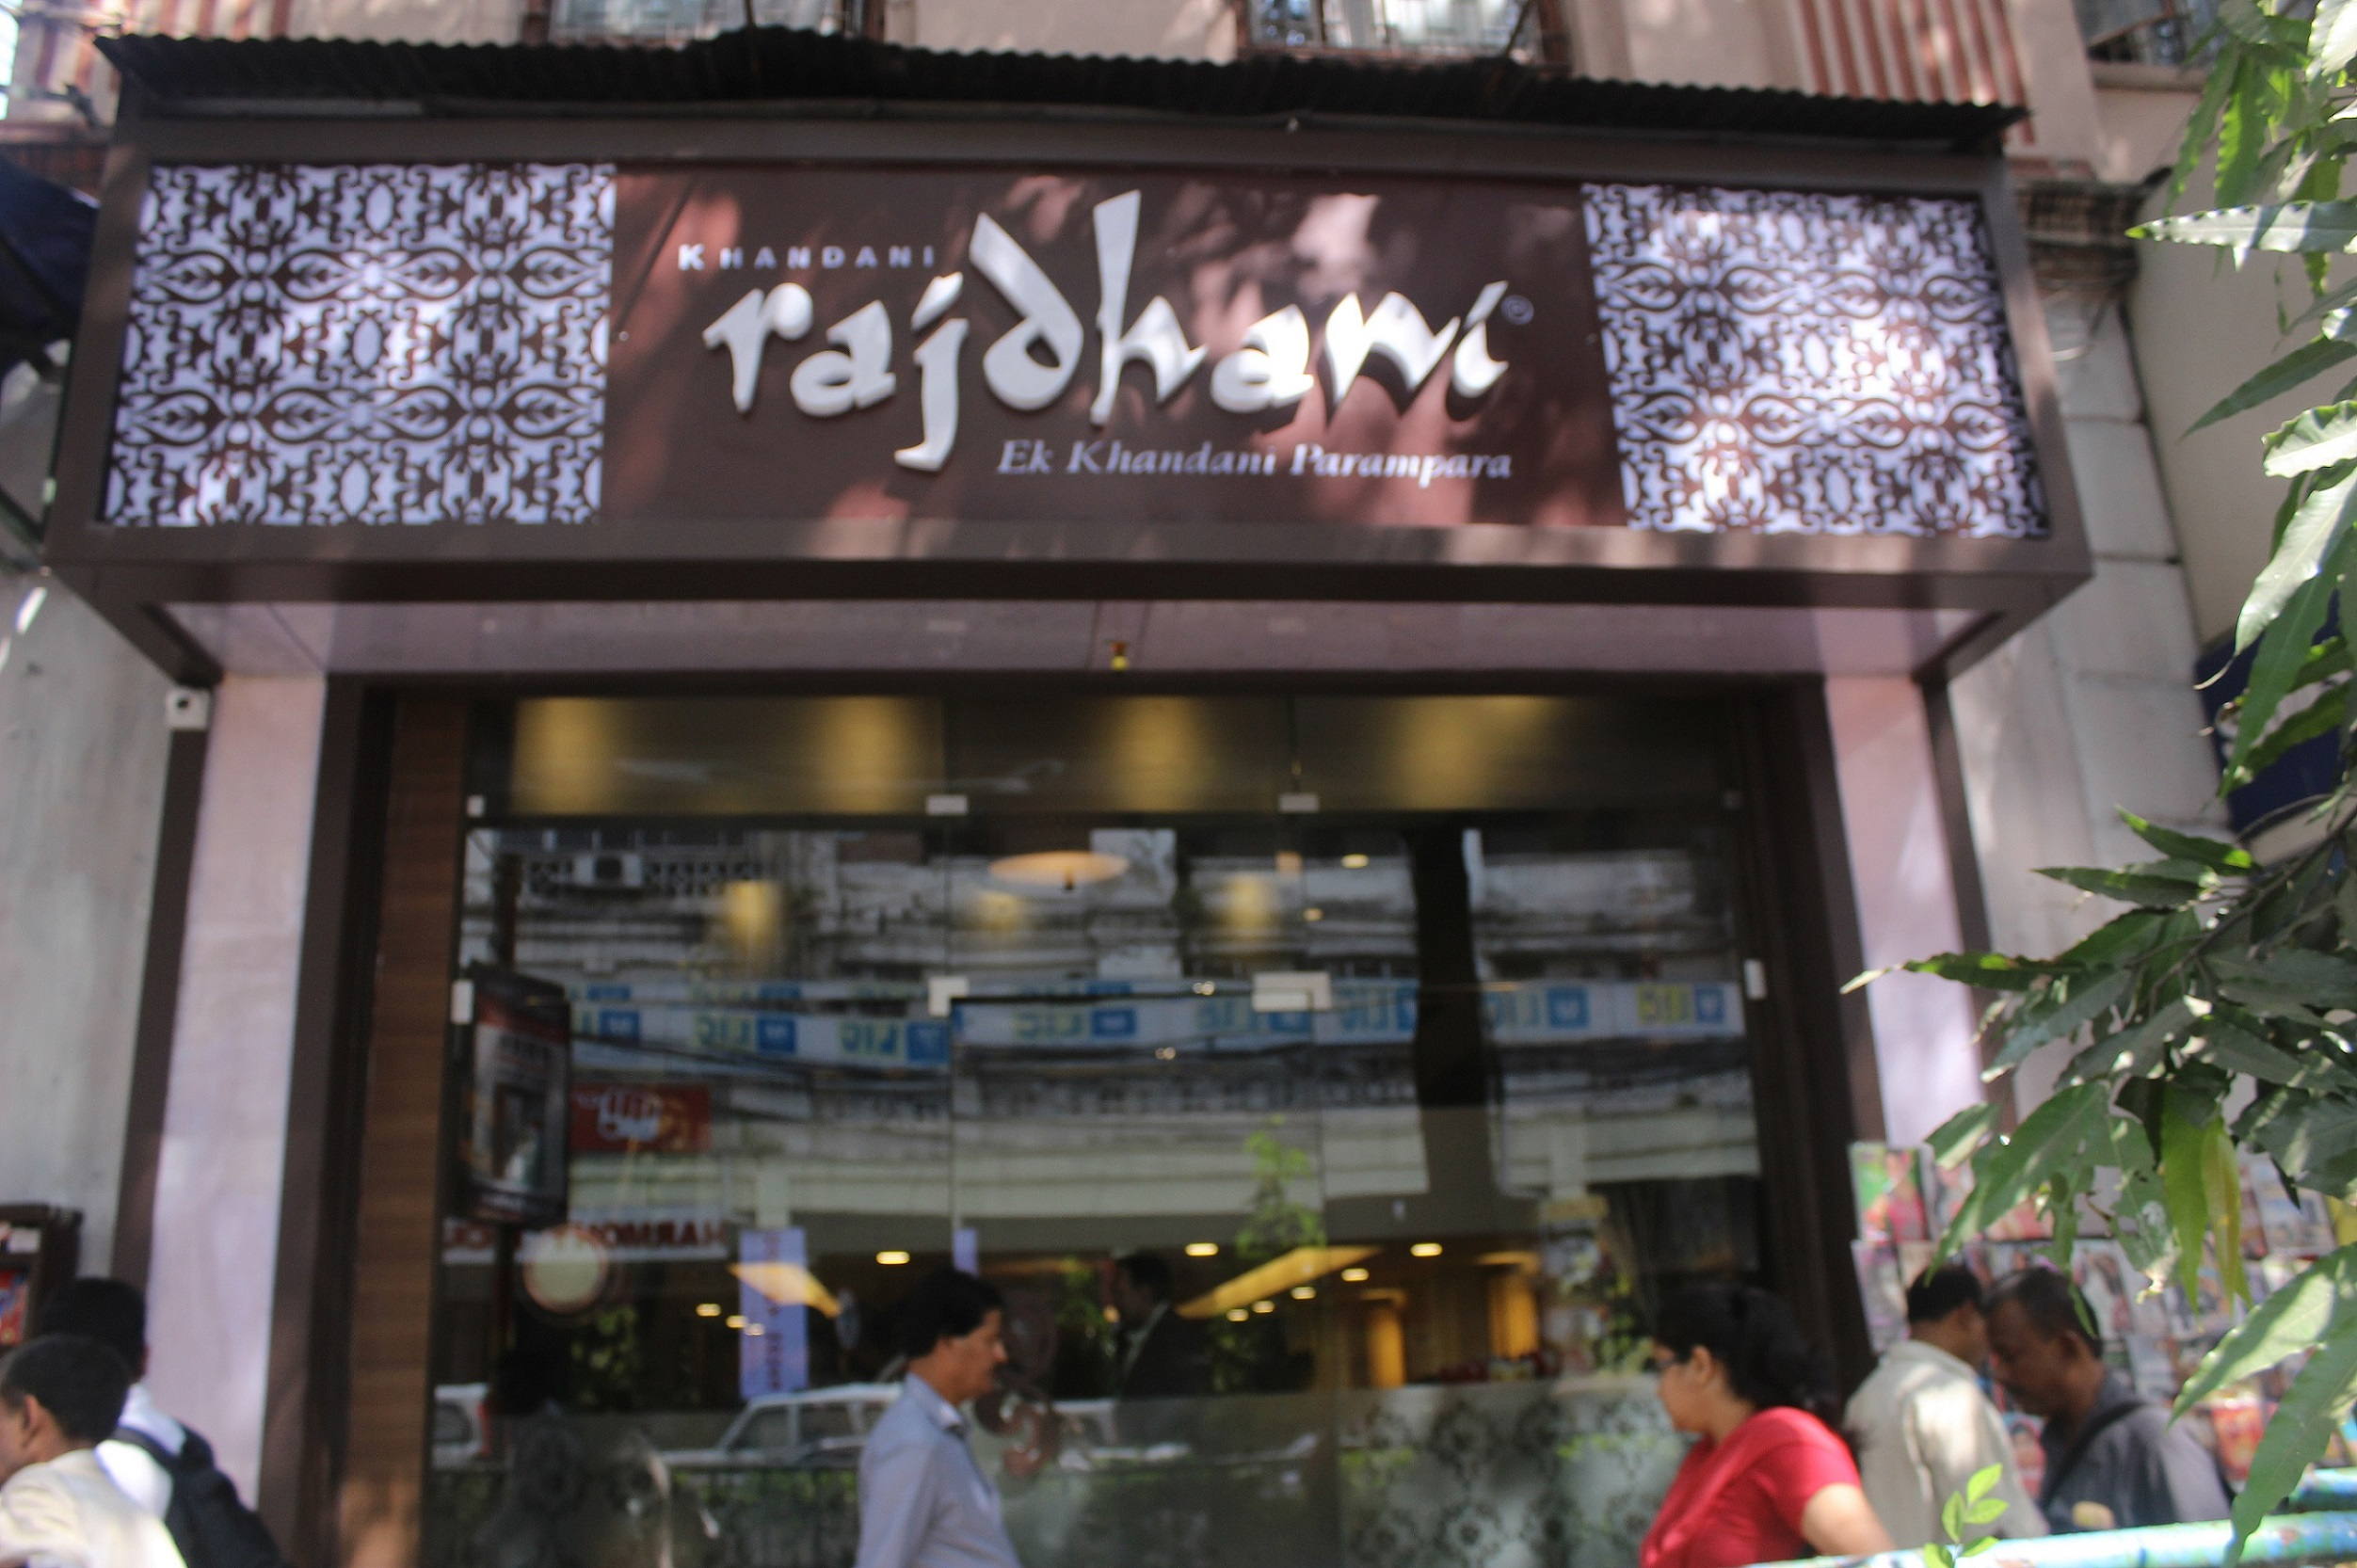 Khandani Rajdhani, Kolkata outlet